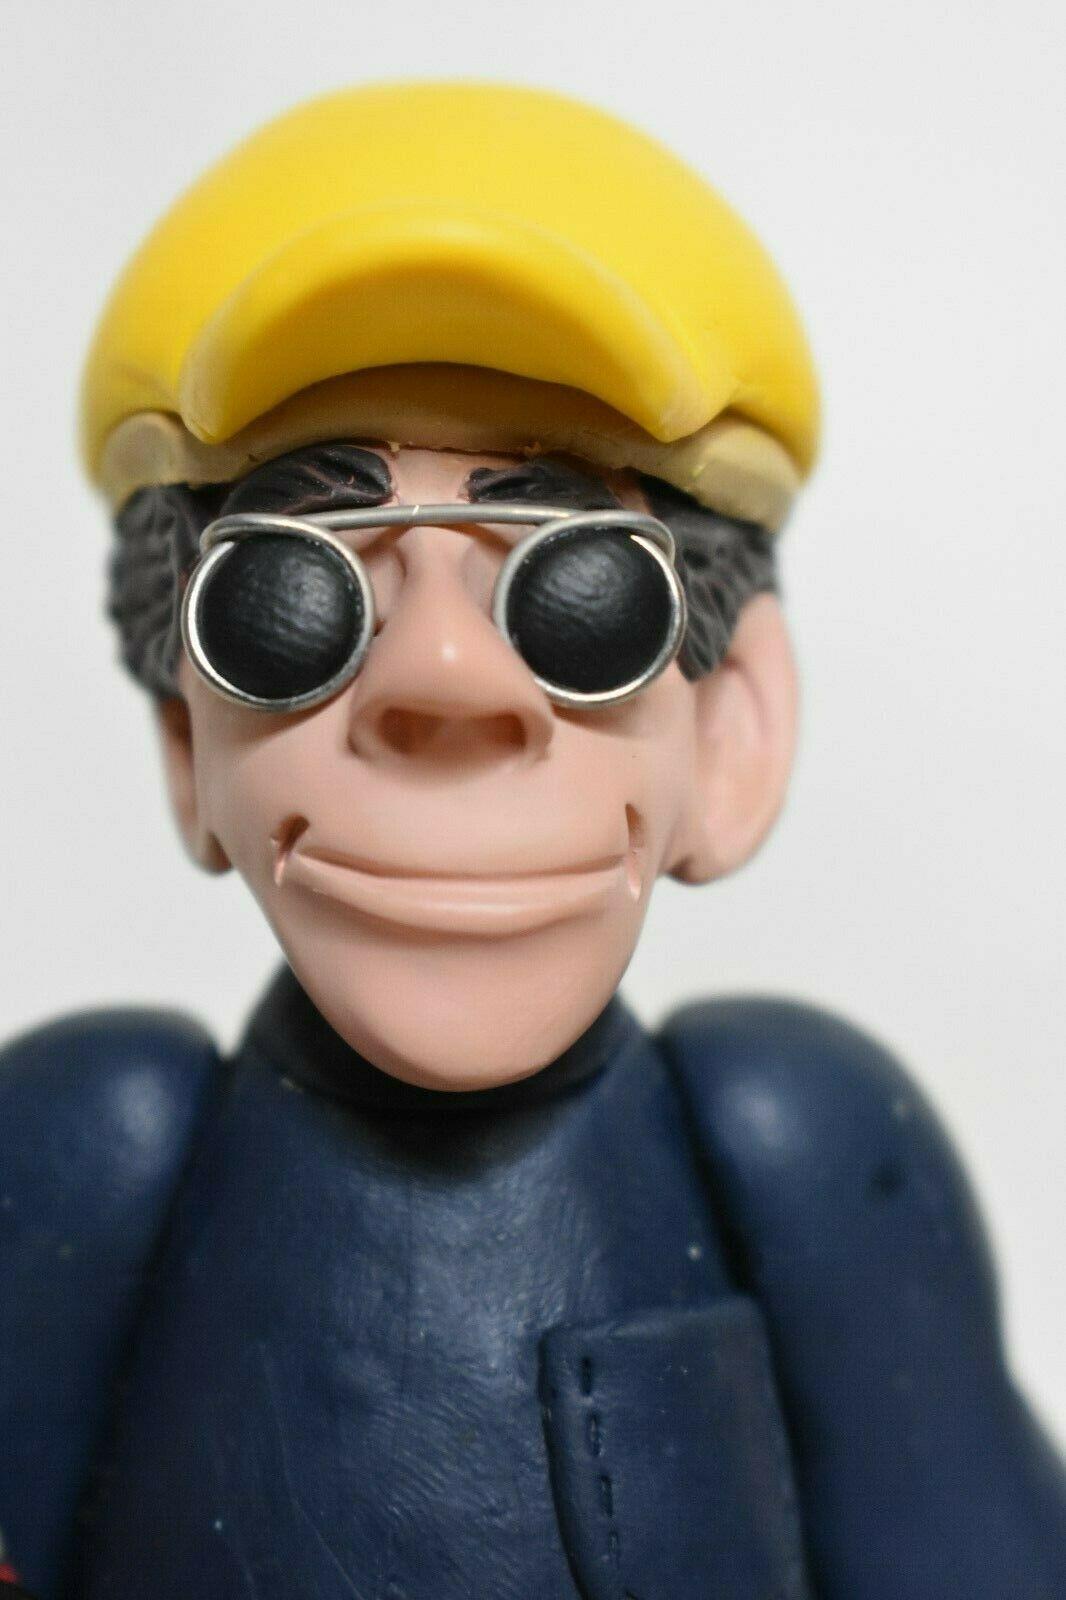 Construction Worker Shelf Sitter Figurine signed J Manning Limited Edition